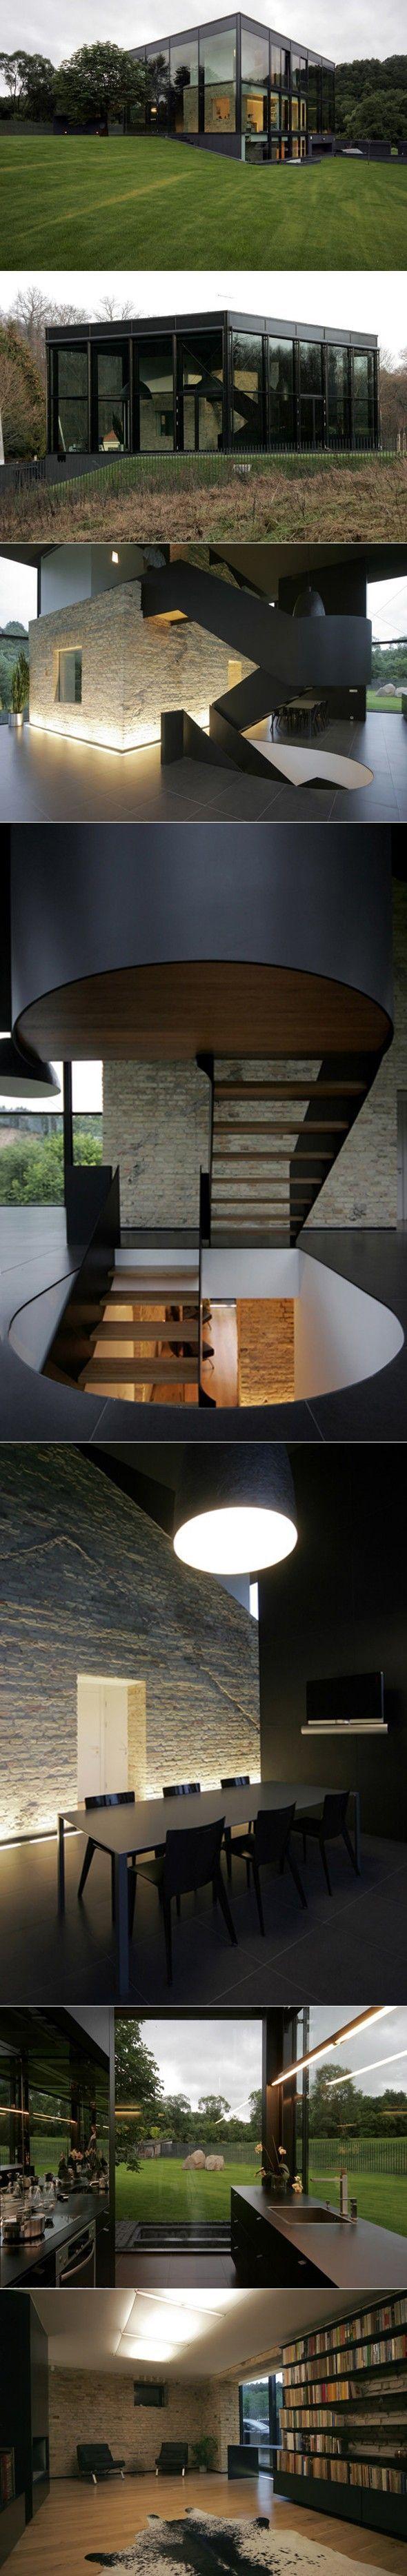 ARCHITECTURE >>> Family House par Architektu Biuras G.Natkevičius ir partneriai - Journal du Design